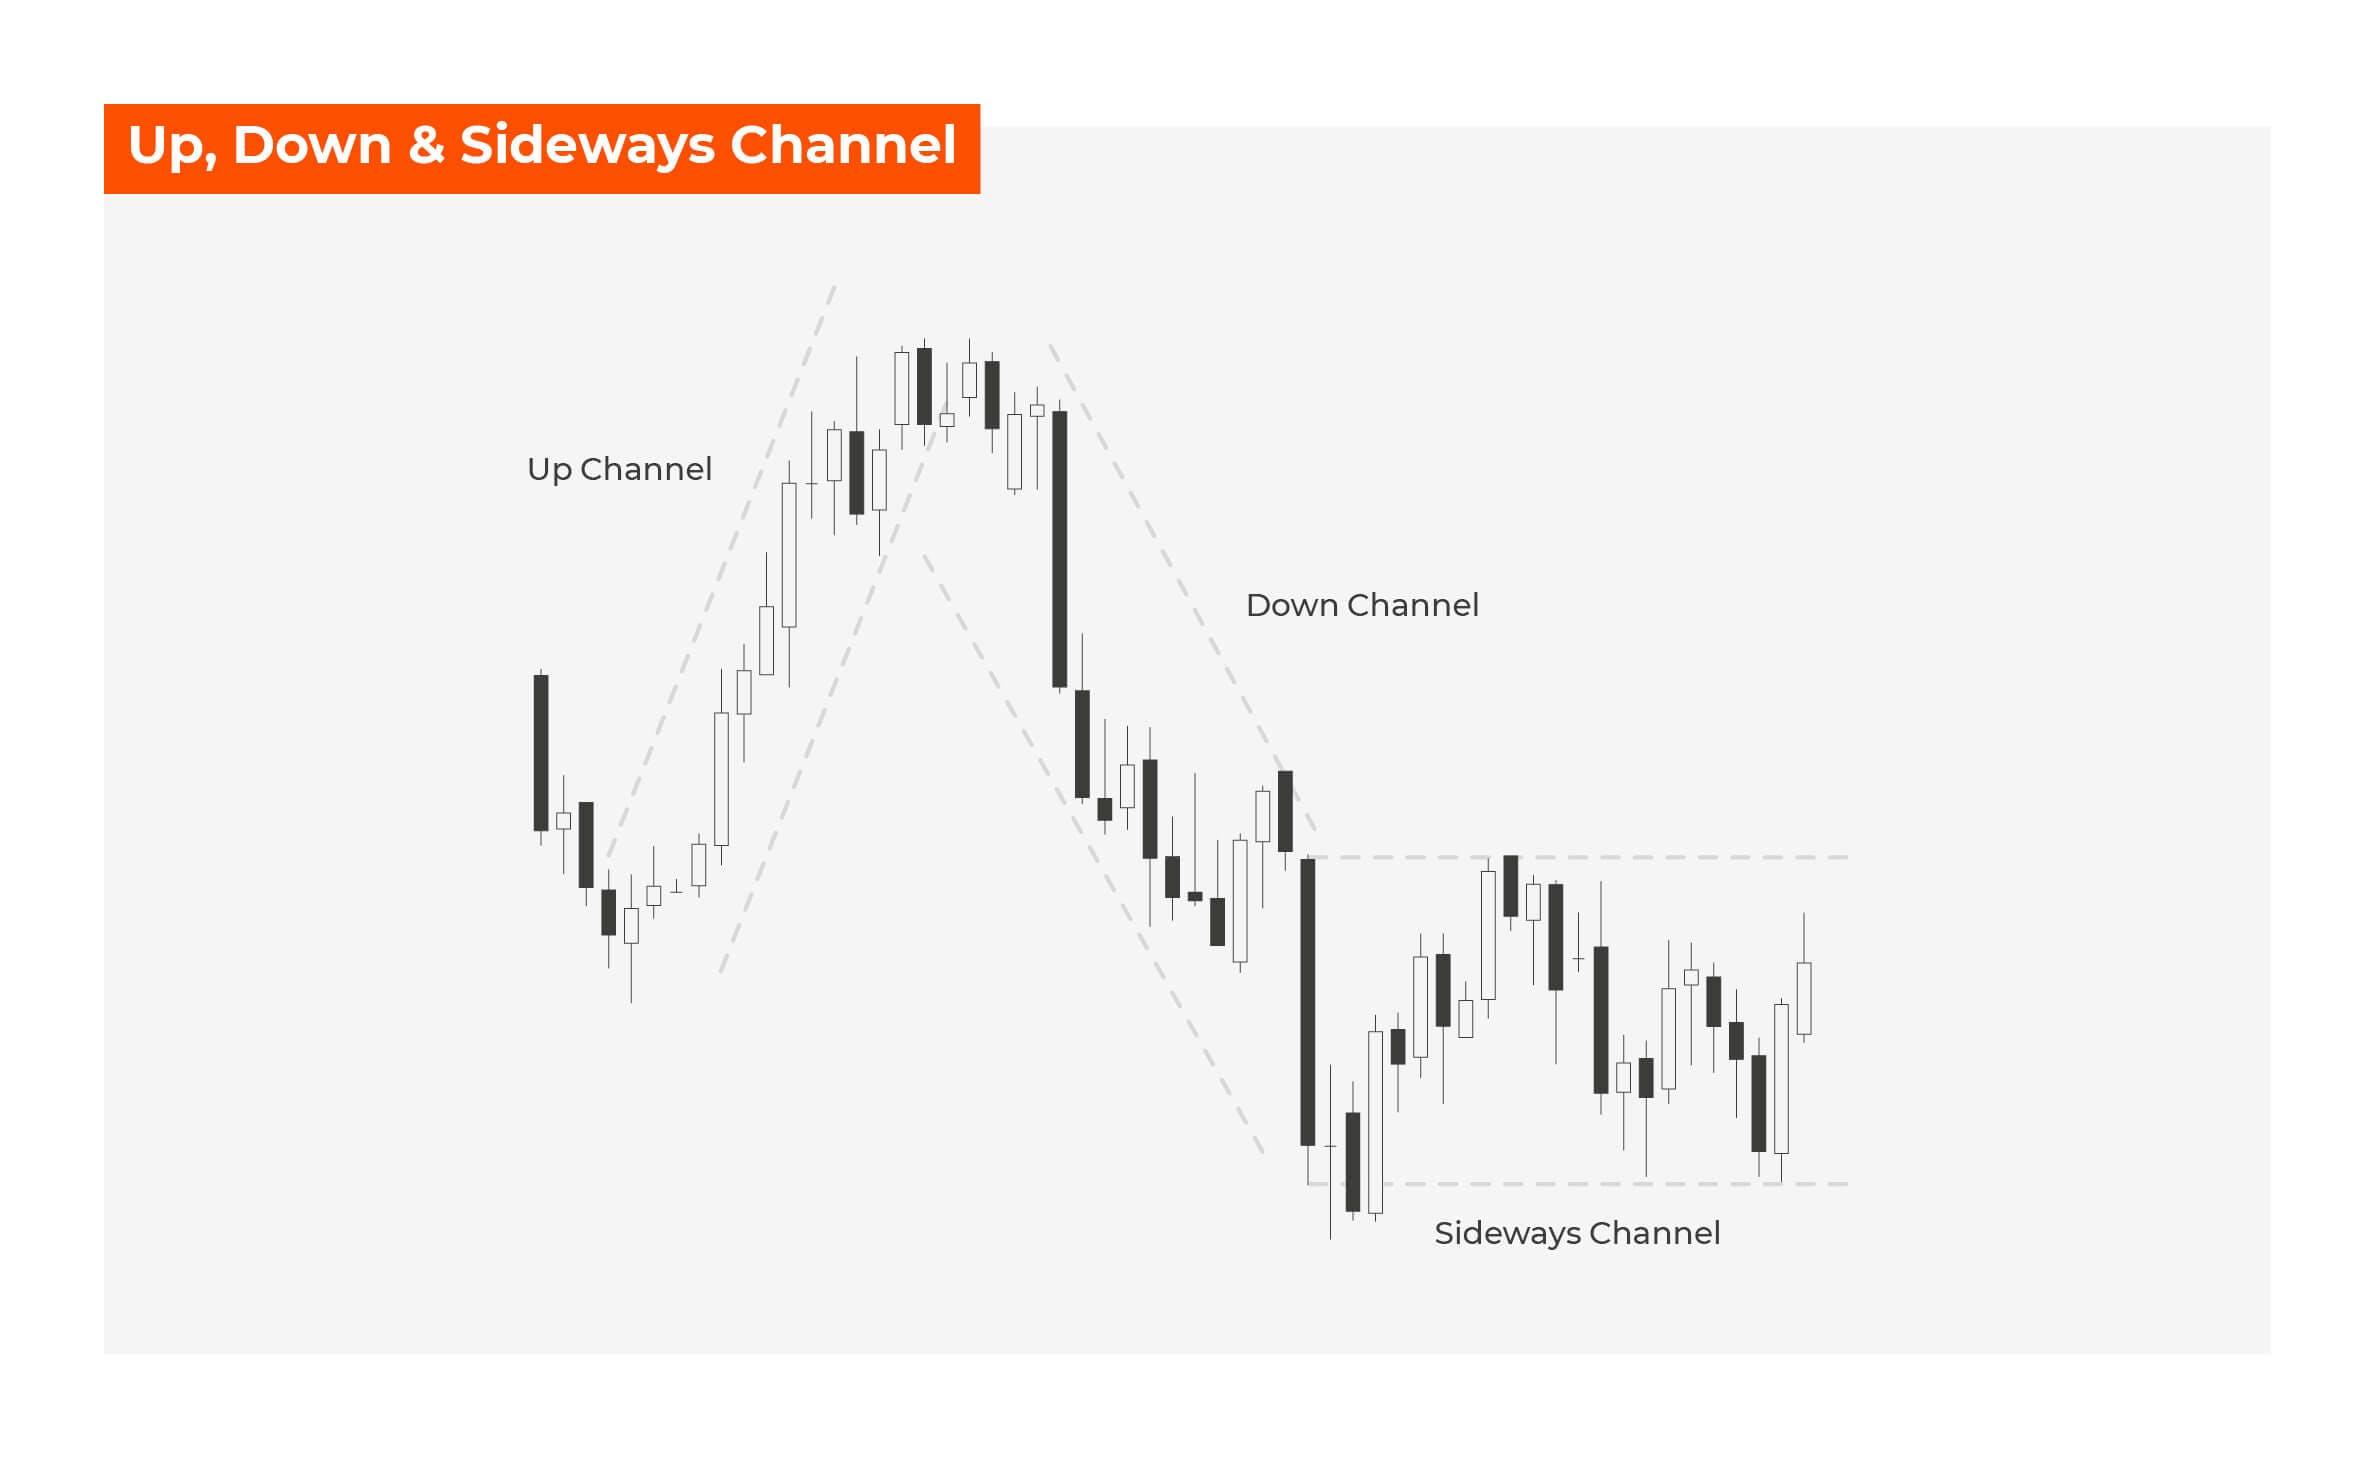 Sideways Channel